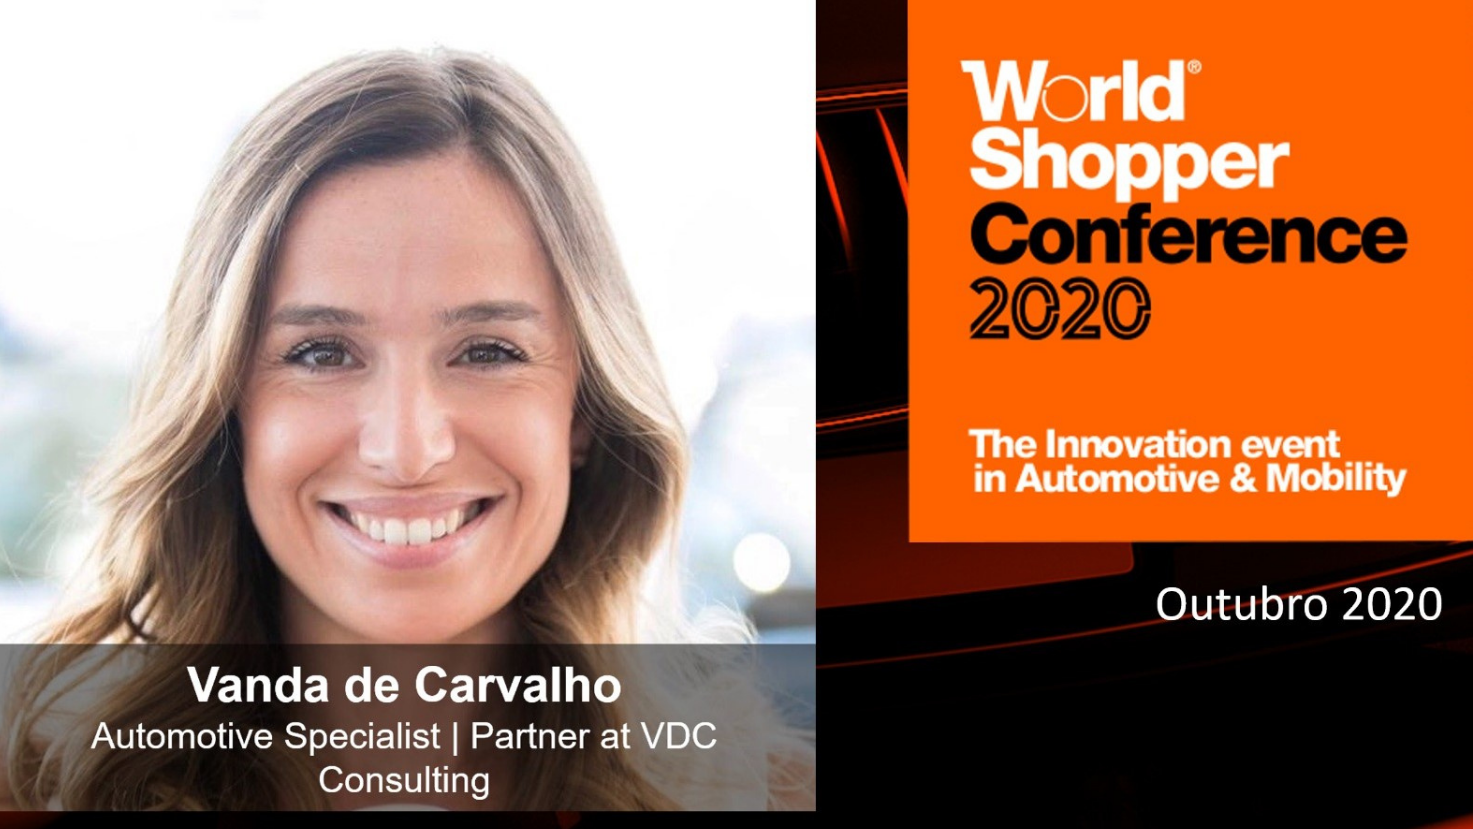 World Shopper Conference 2020